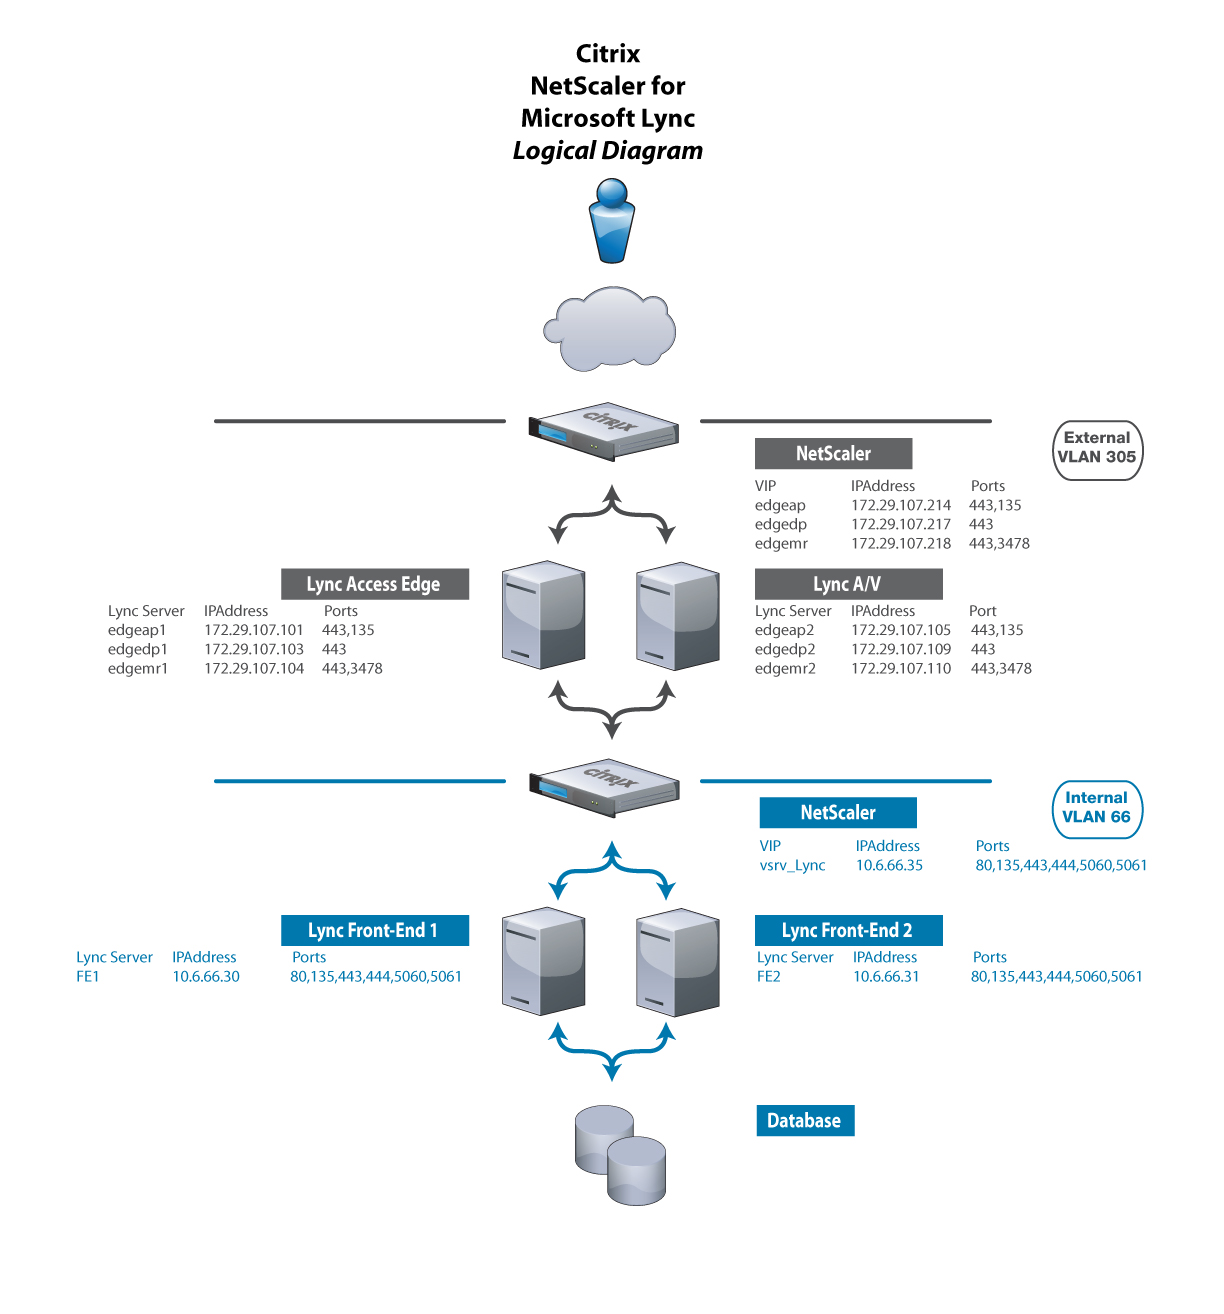 citrix netscaler diagram 2002 nissan xterra car stereo wiring ryan betts cloud solutions architect configuring to load balance adfs v3 0